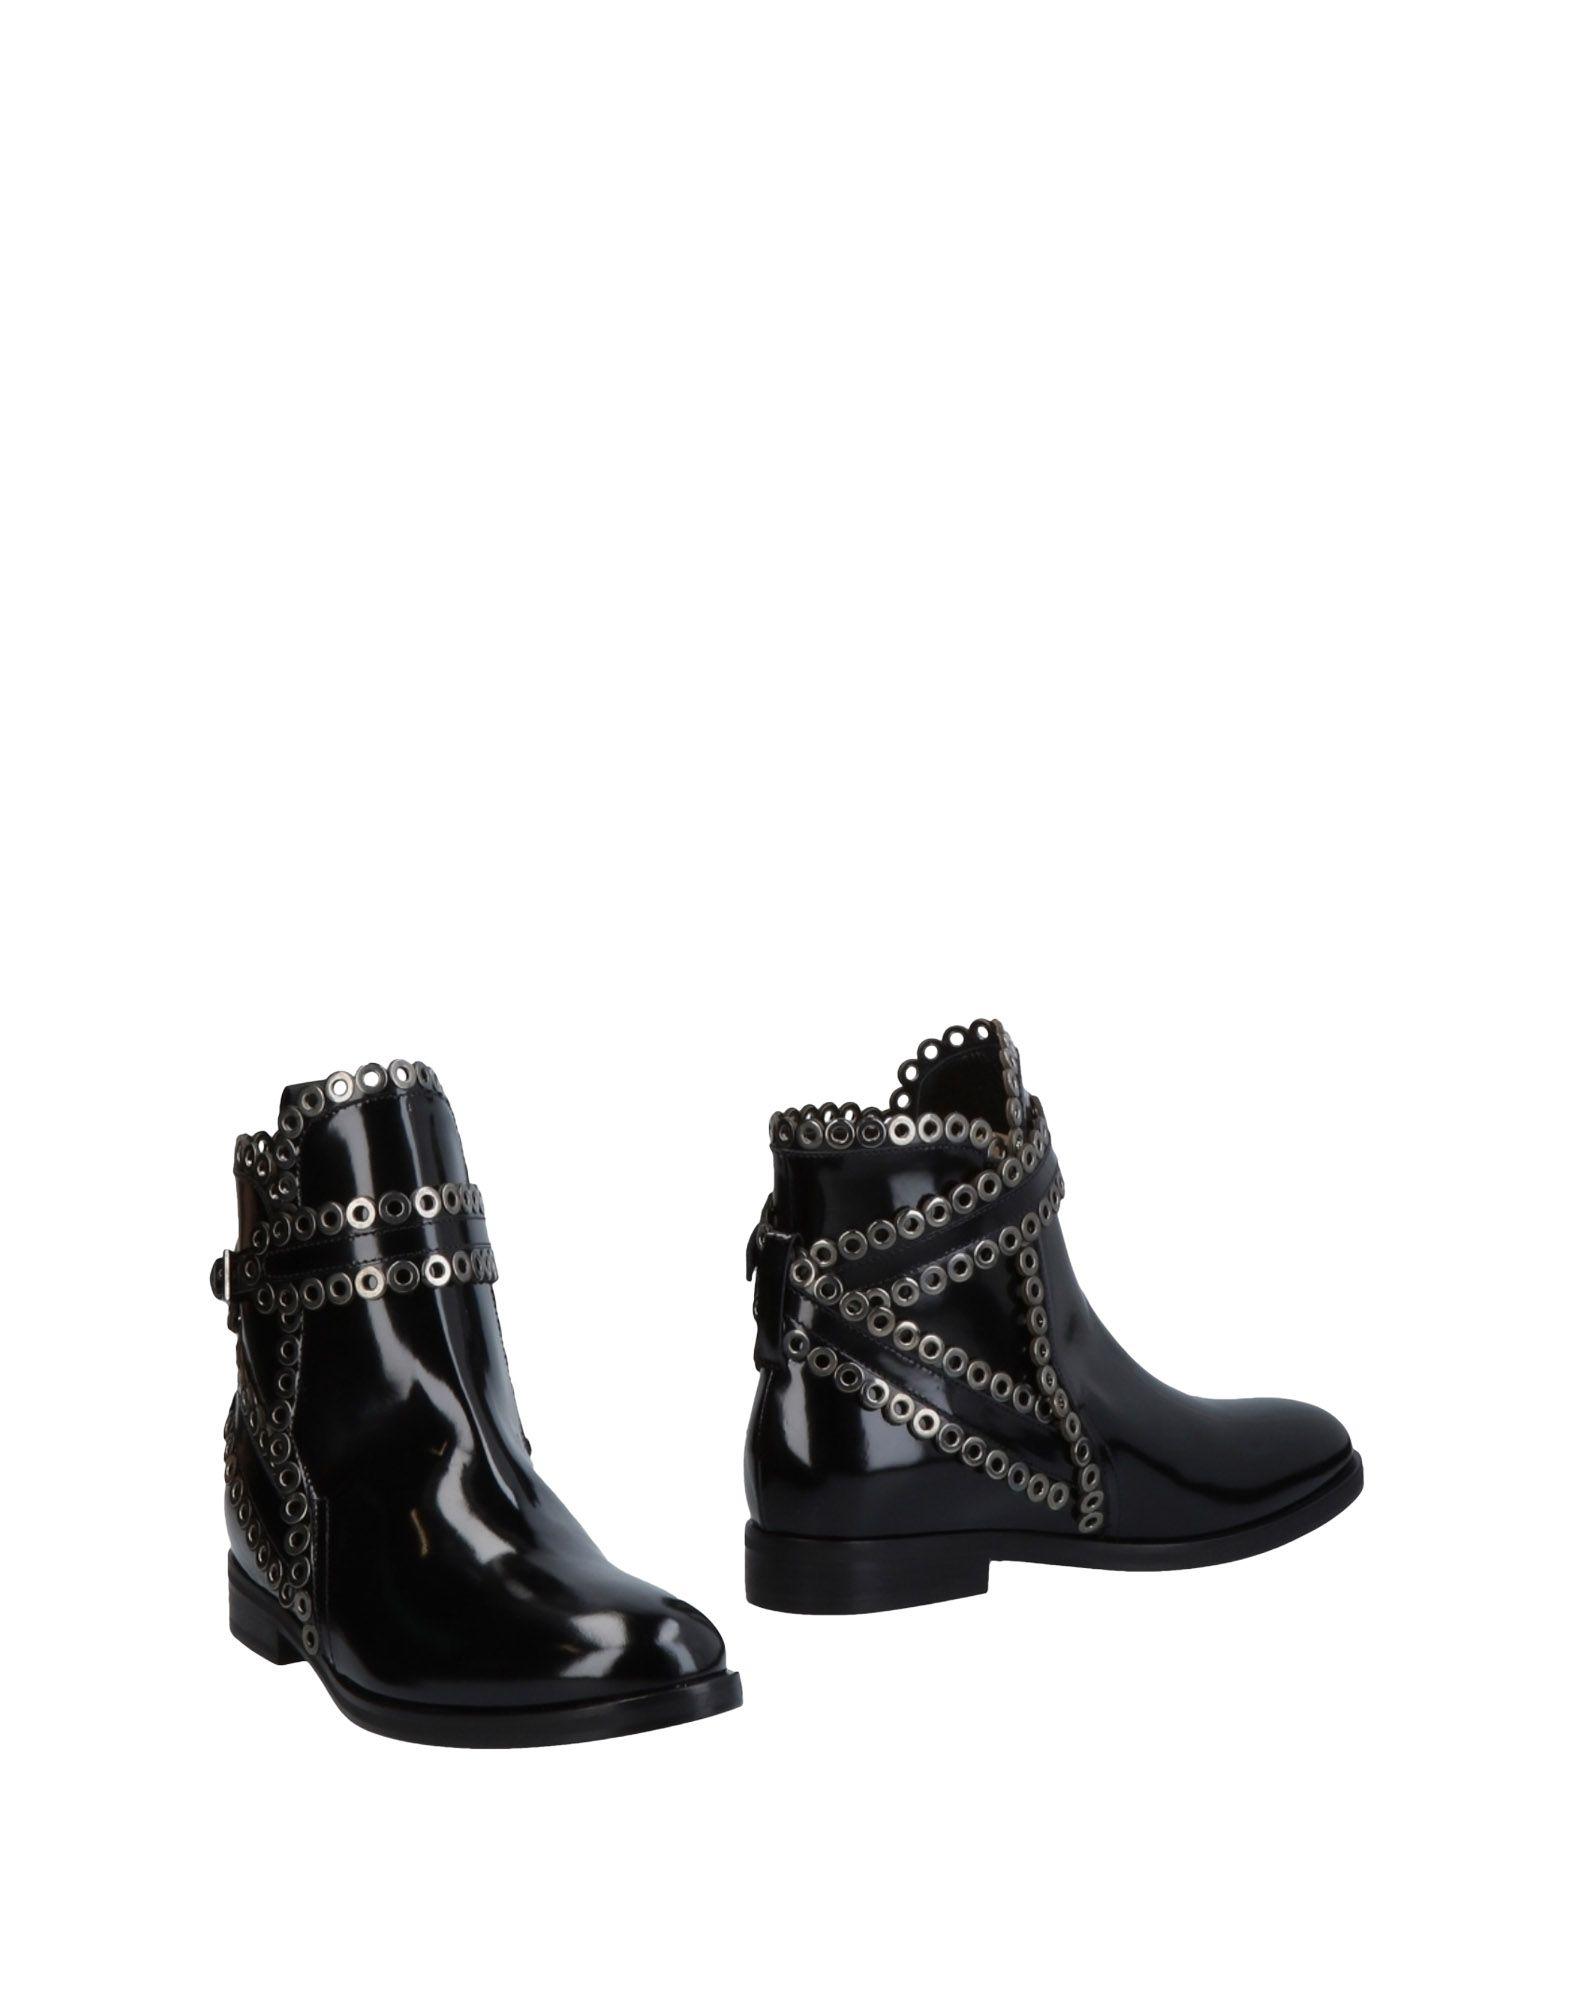 Alaïa Stiefelette Damen Schuhe  11463519QSGünstige gut aussehende Schuhe Damen 0fcdbd